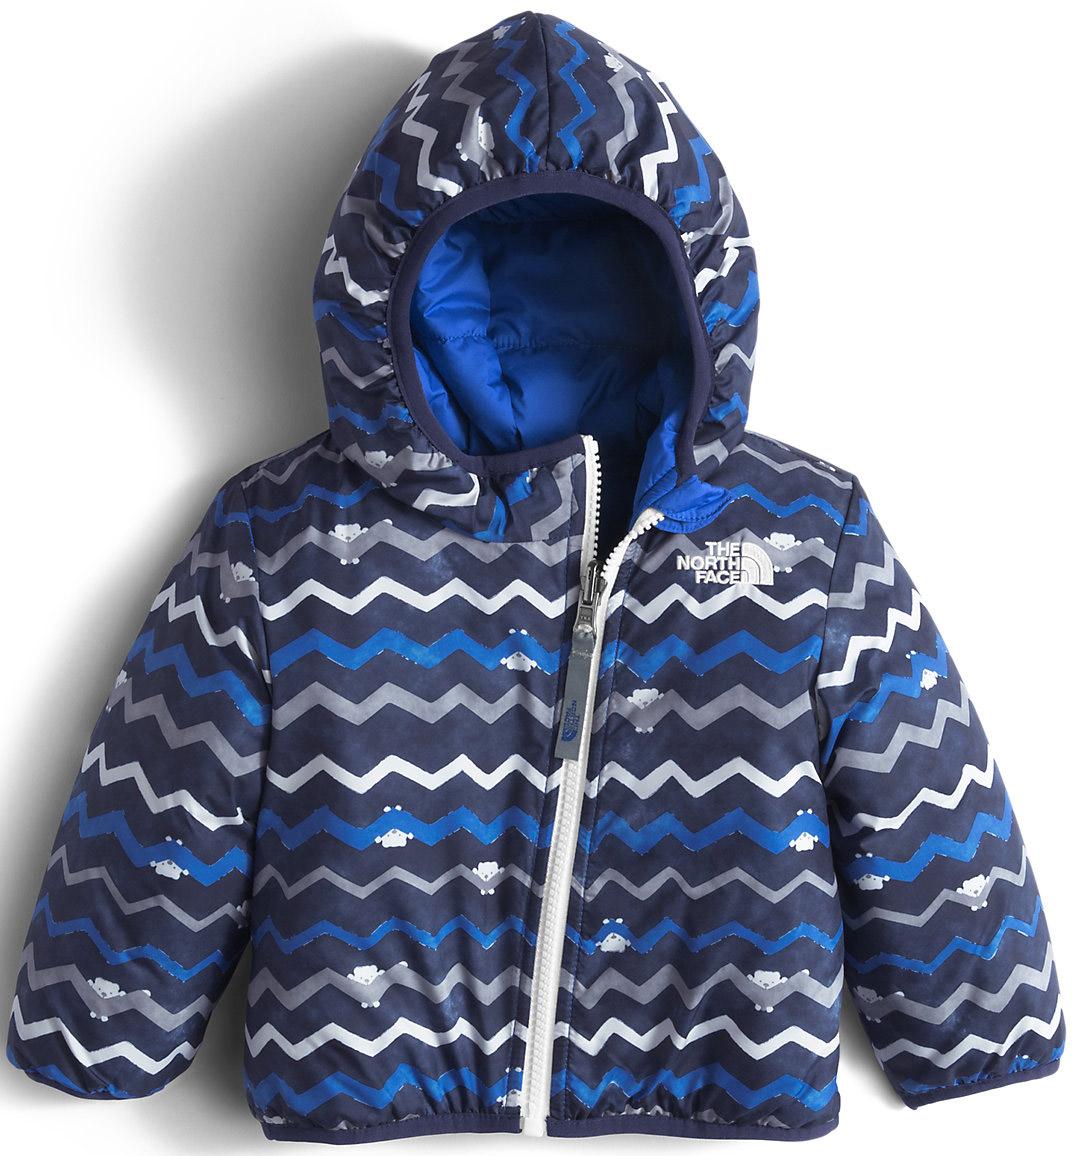 6059544c1f22 The North Face Reversible Perrito Ski Jacket - Infant 2017